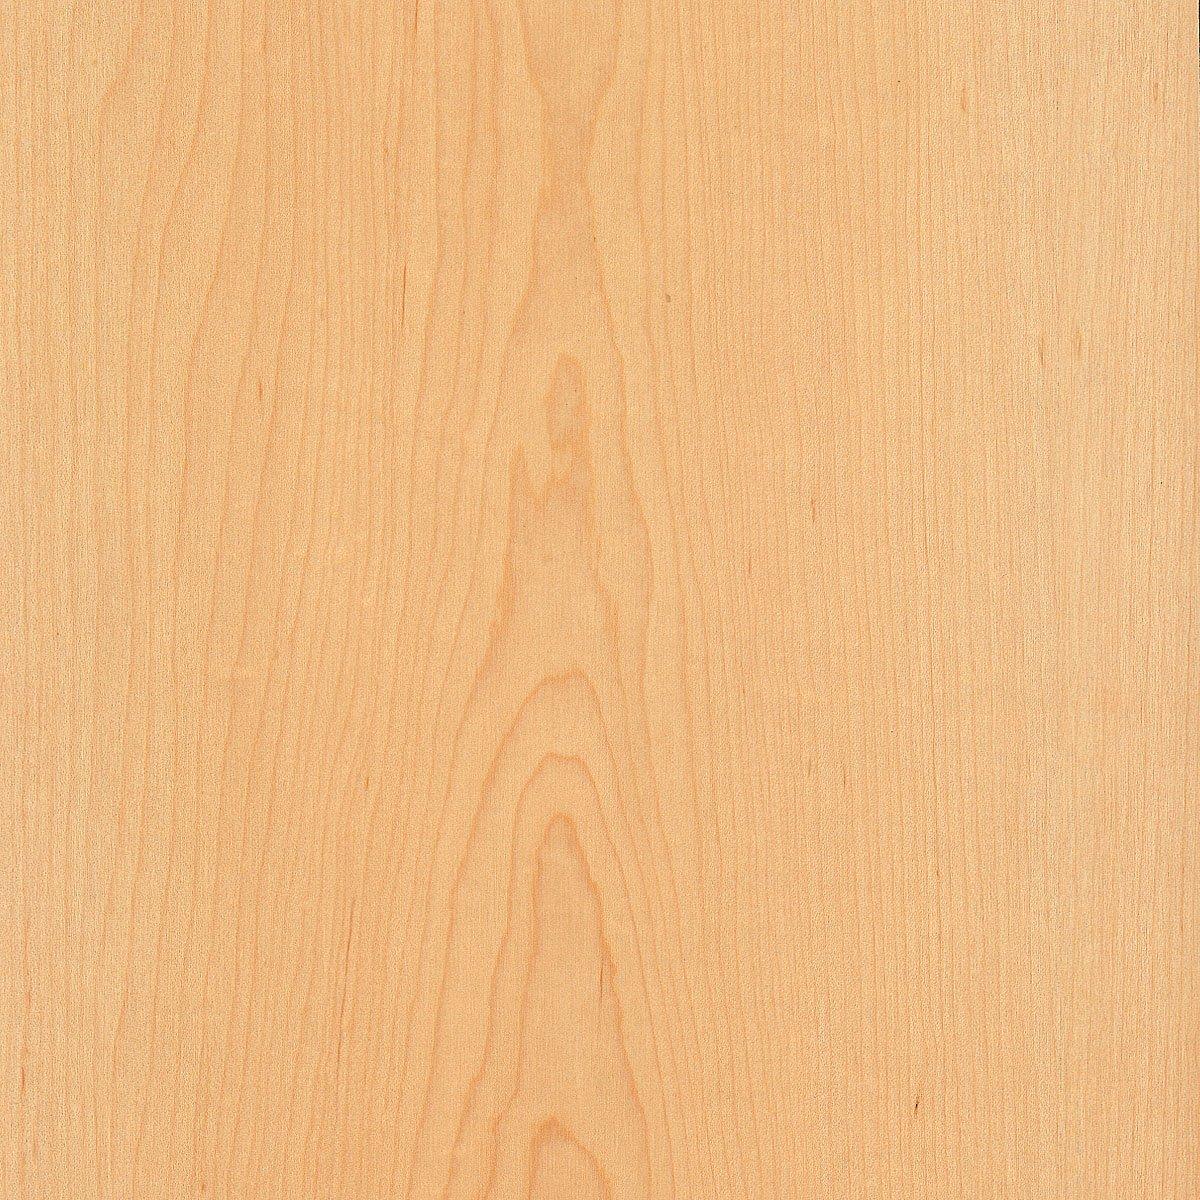 Maple Wood Veneer Plain Sliced 4x10 NBL(Woodback) Sheet FormWood